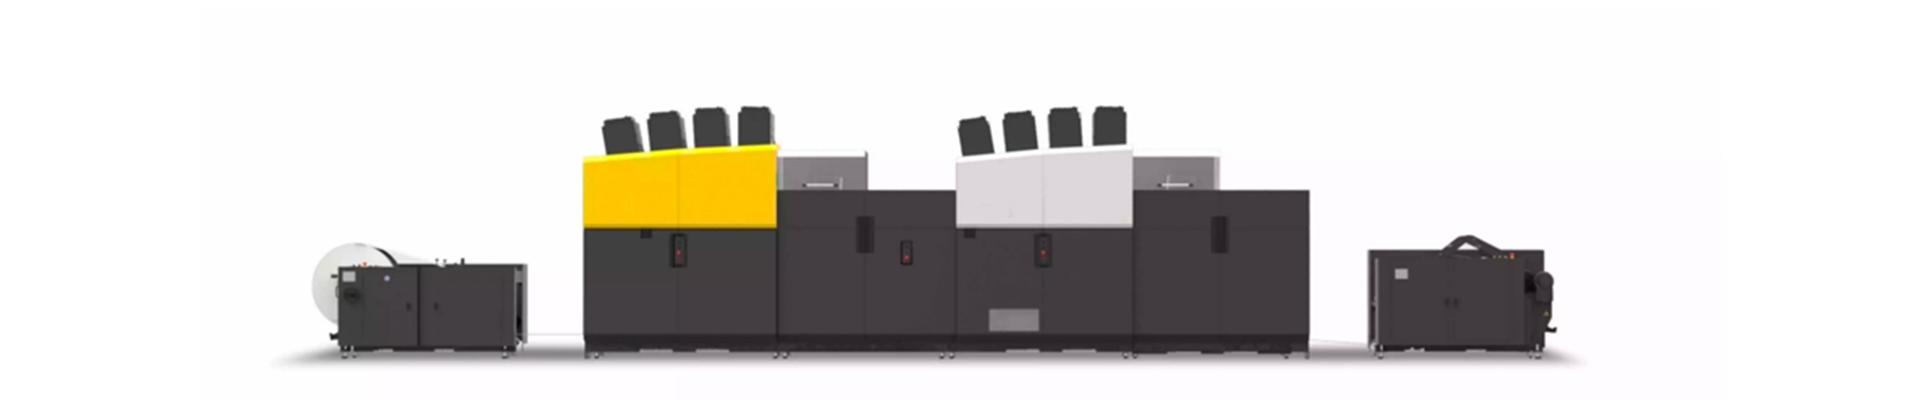 Printing Newsletter april 2021